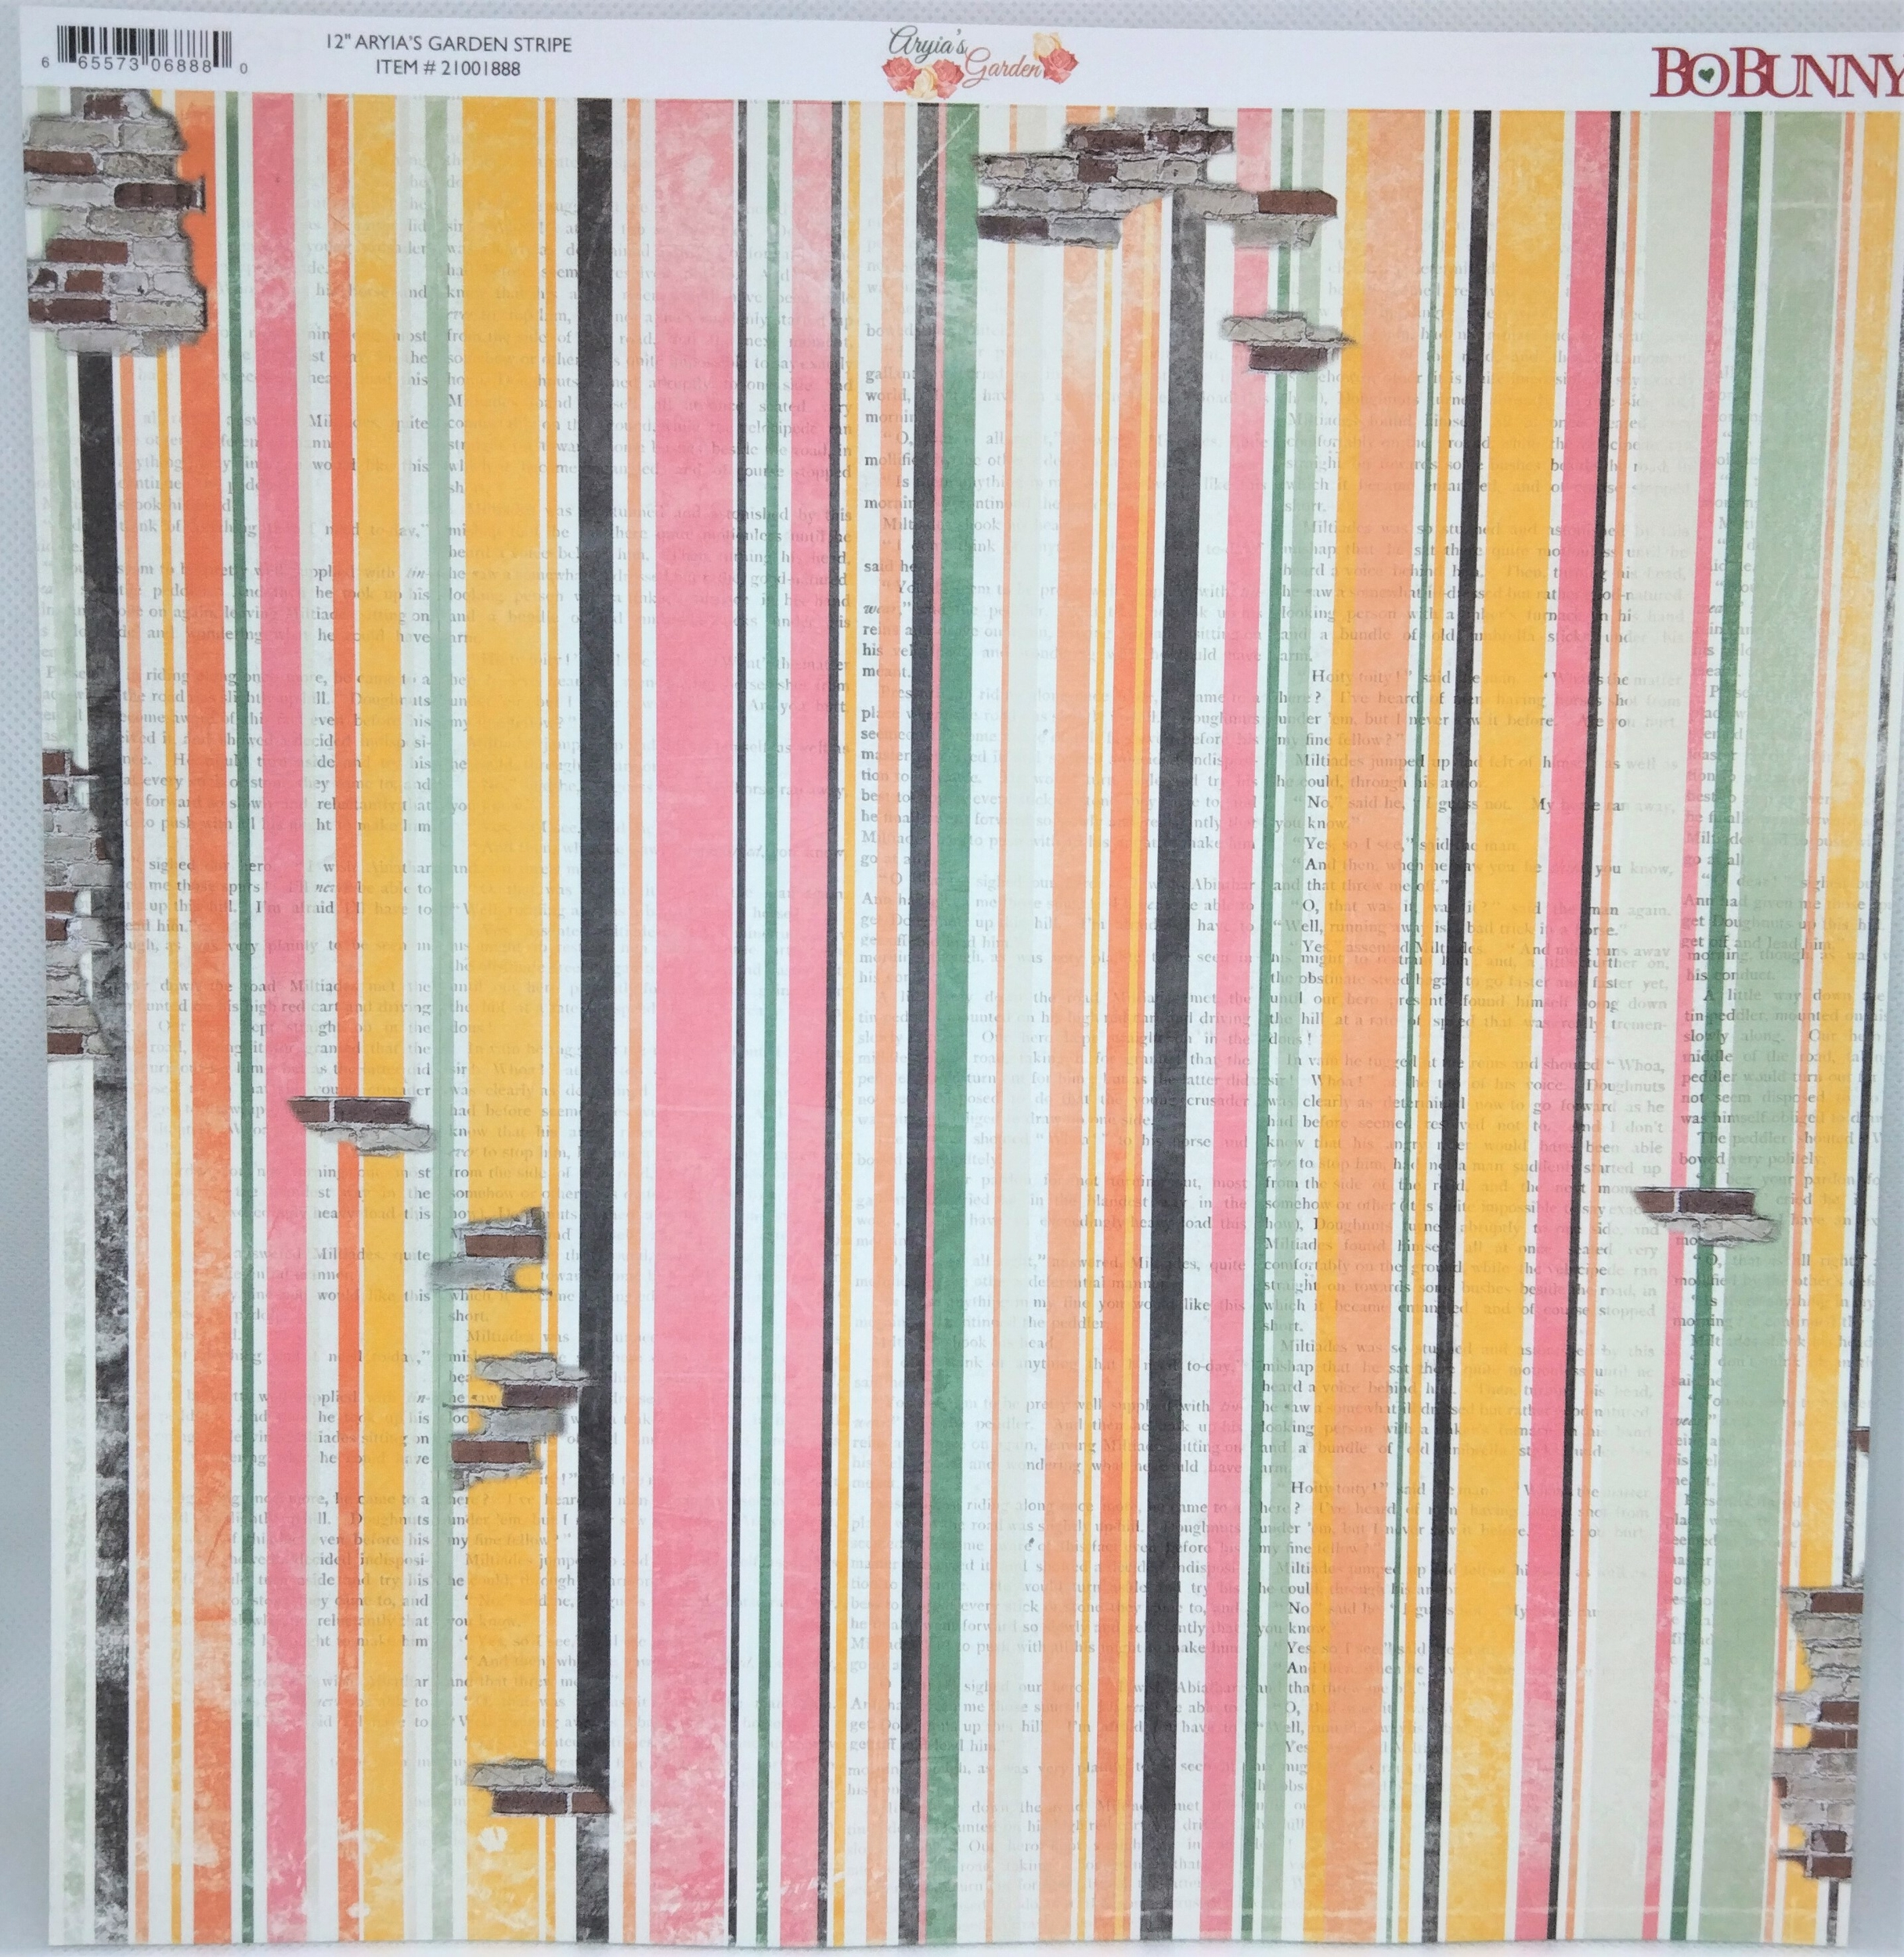 Planche double face 30.5 x 30.5 cms -160 g/m2 - Collection Aryia\'s Garden - Stripe